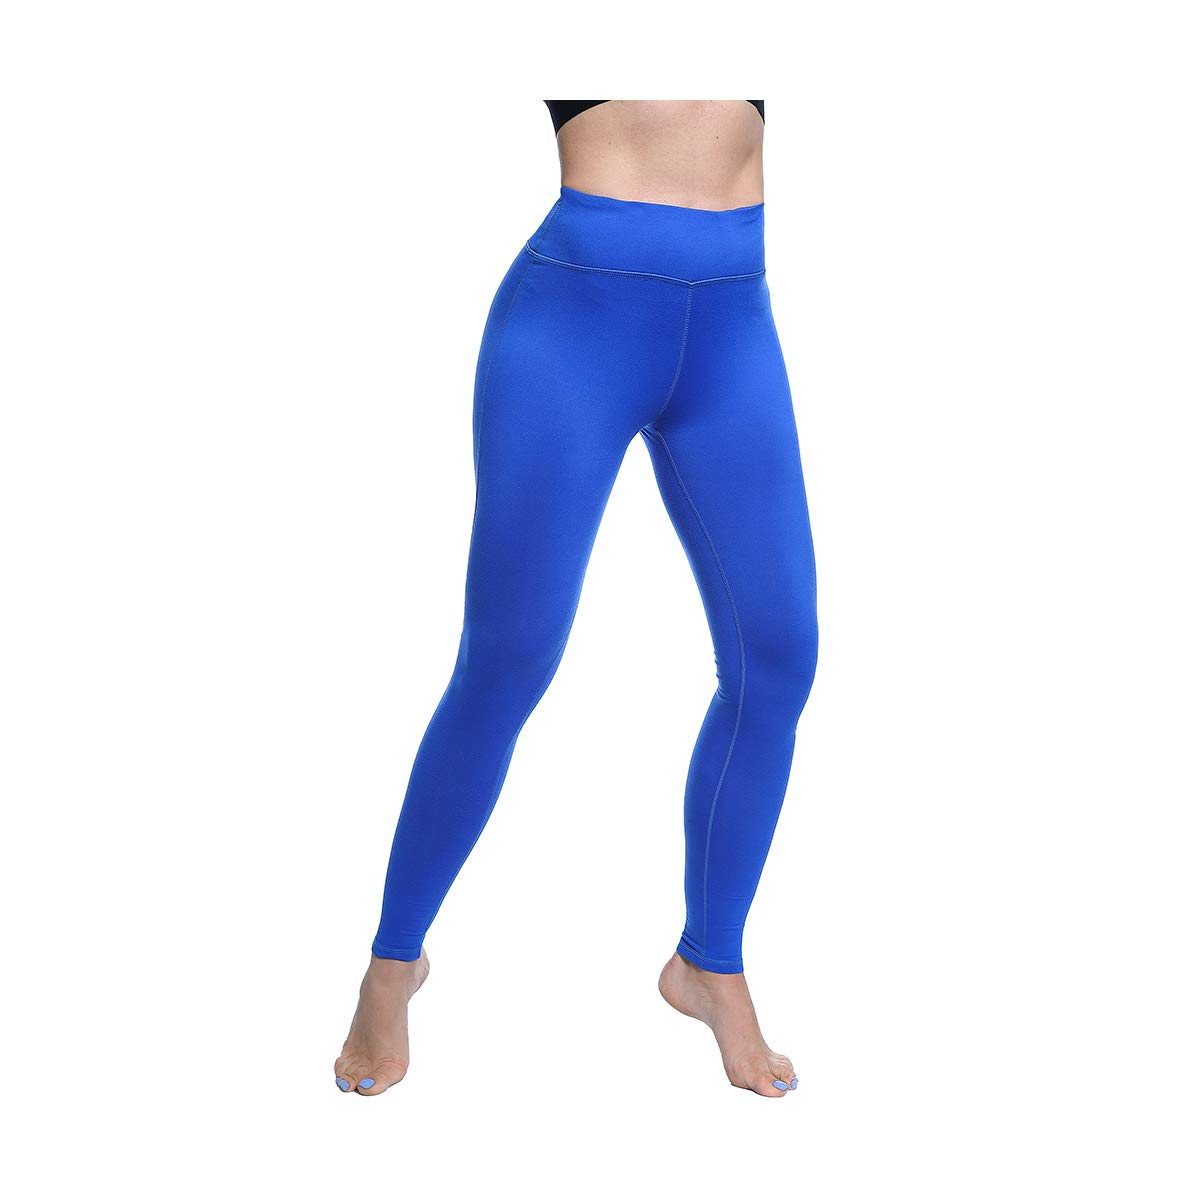 Basicbrilliant bluee FEIVO Yoga Pants, Womens Power Flex Yoga Pants Tummy Control Workout Yoga Capris